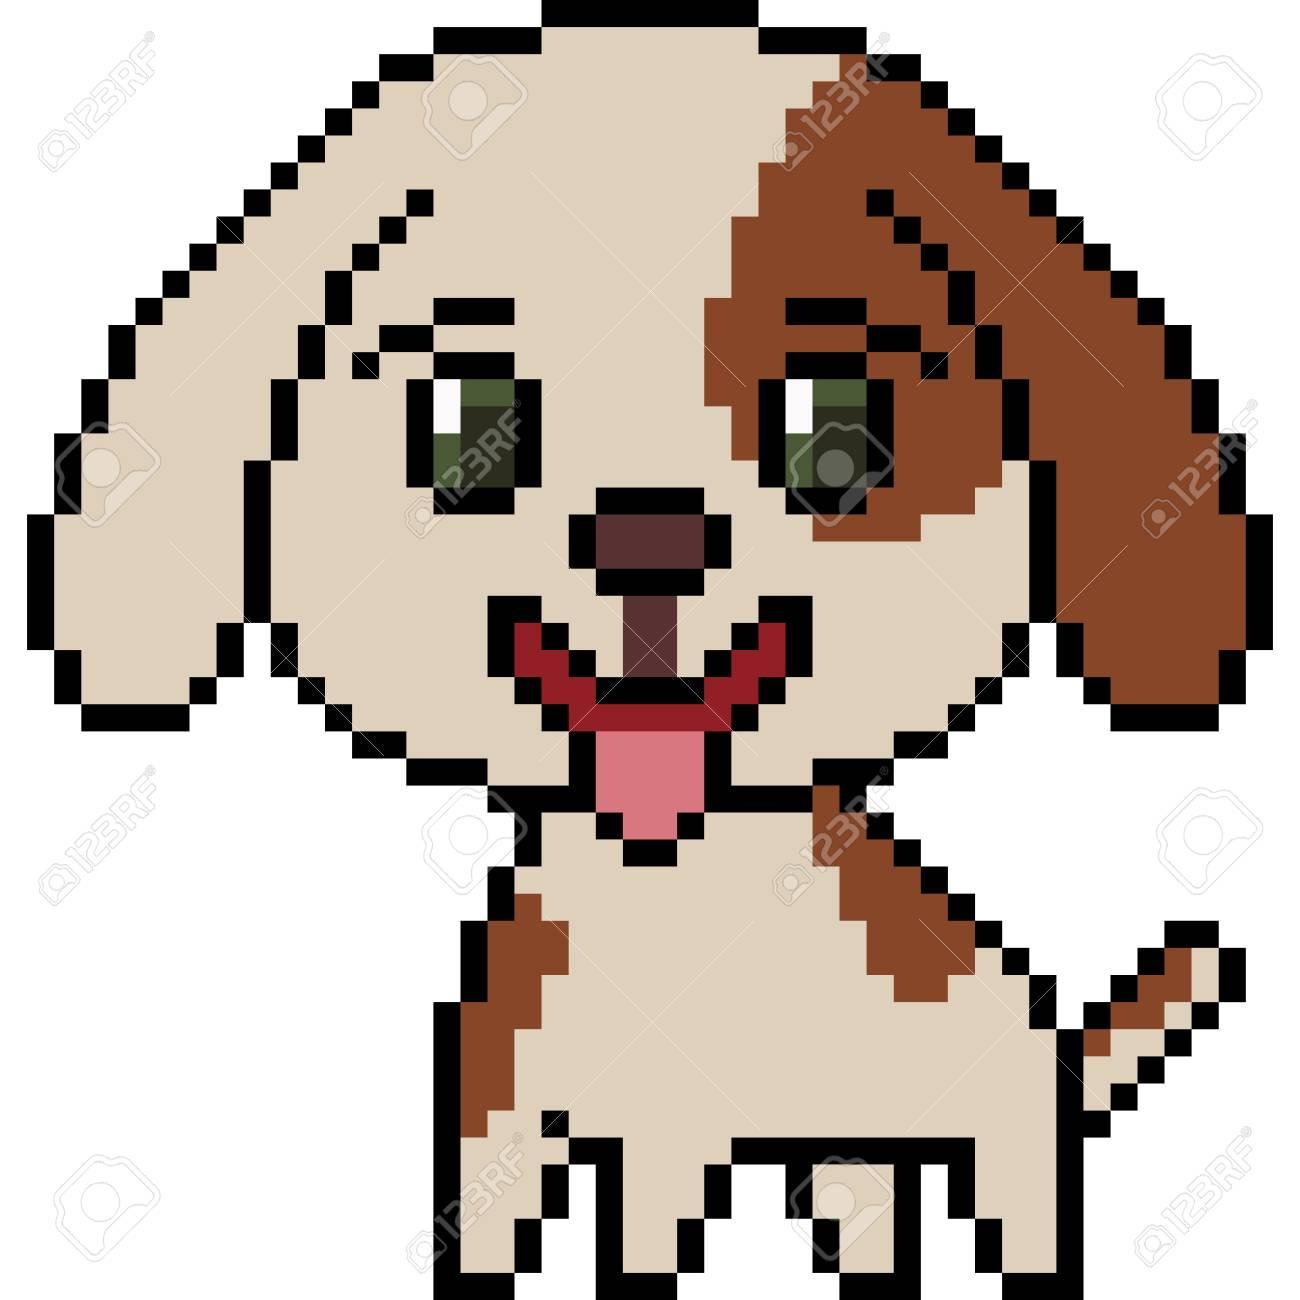 Dessin Pixel Art Chien